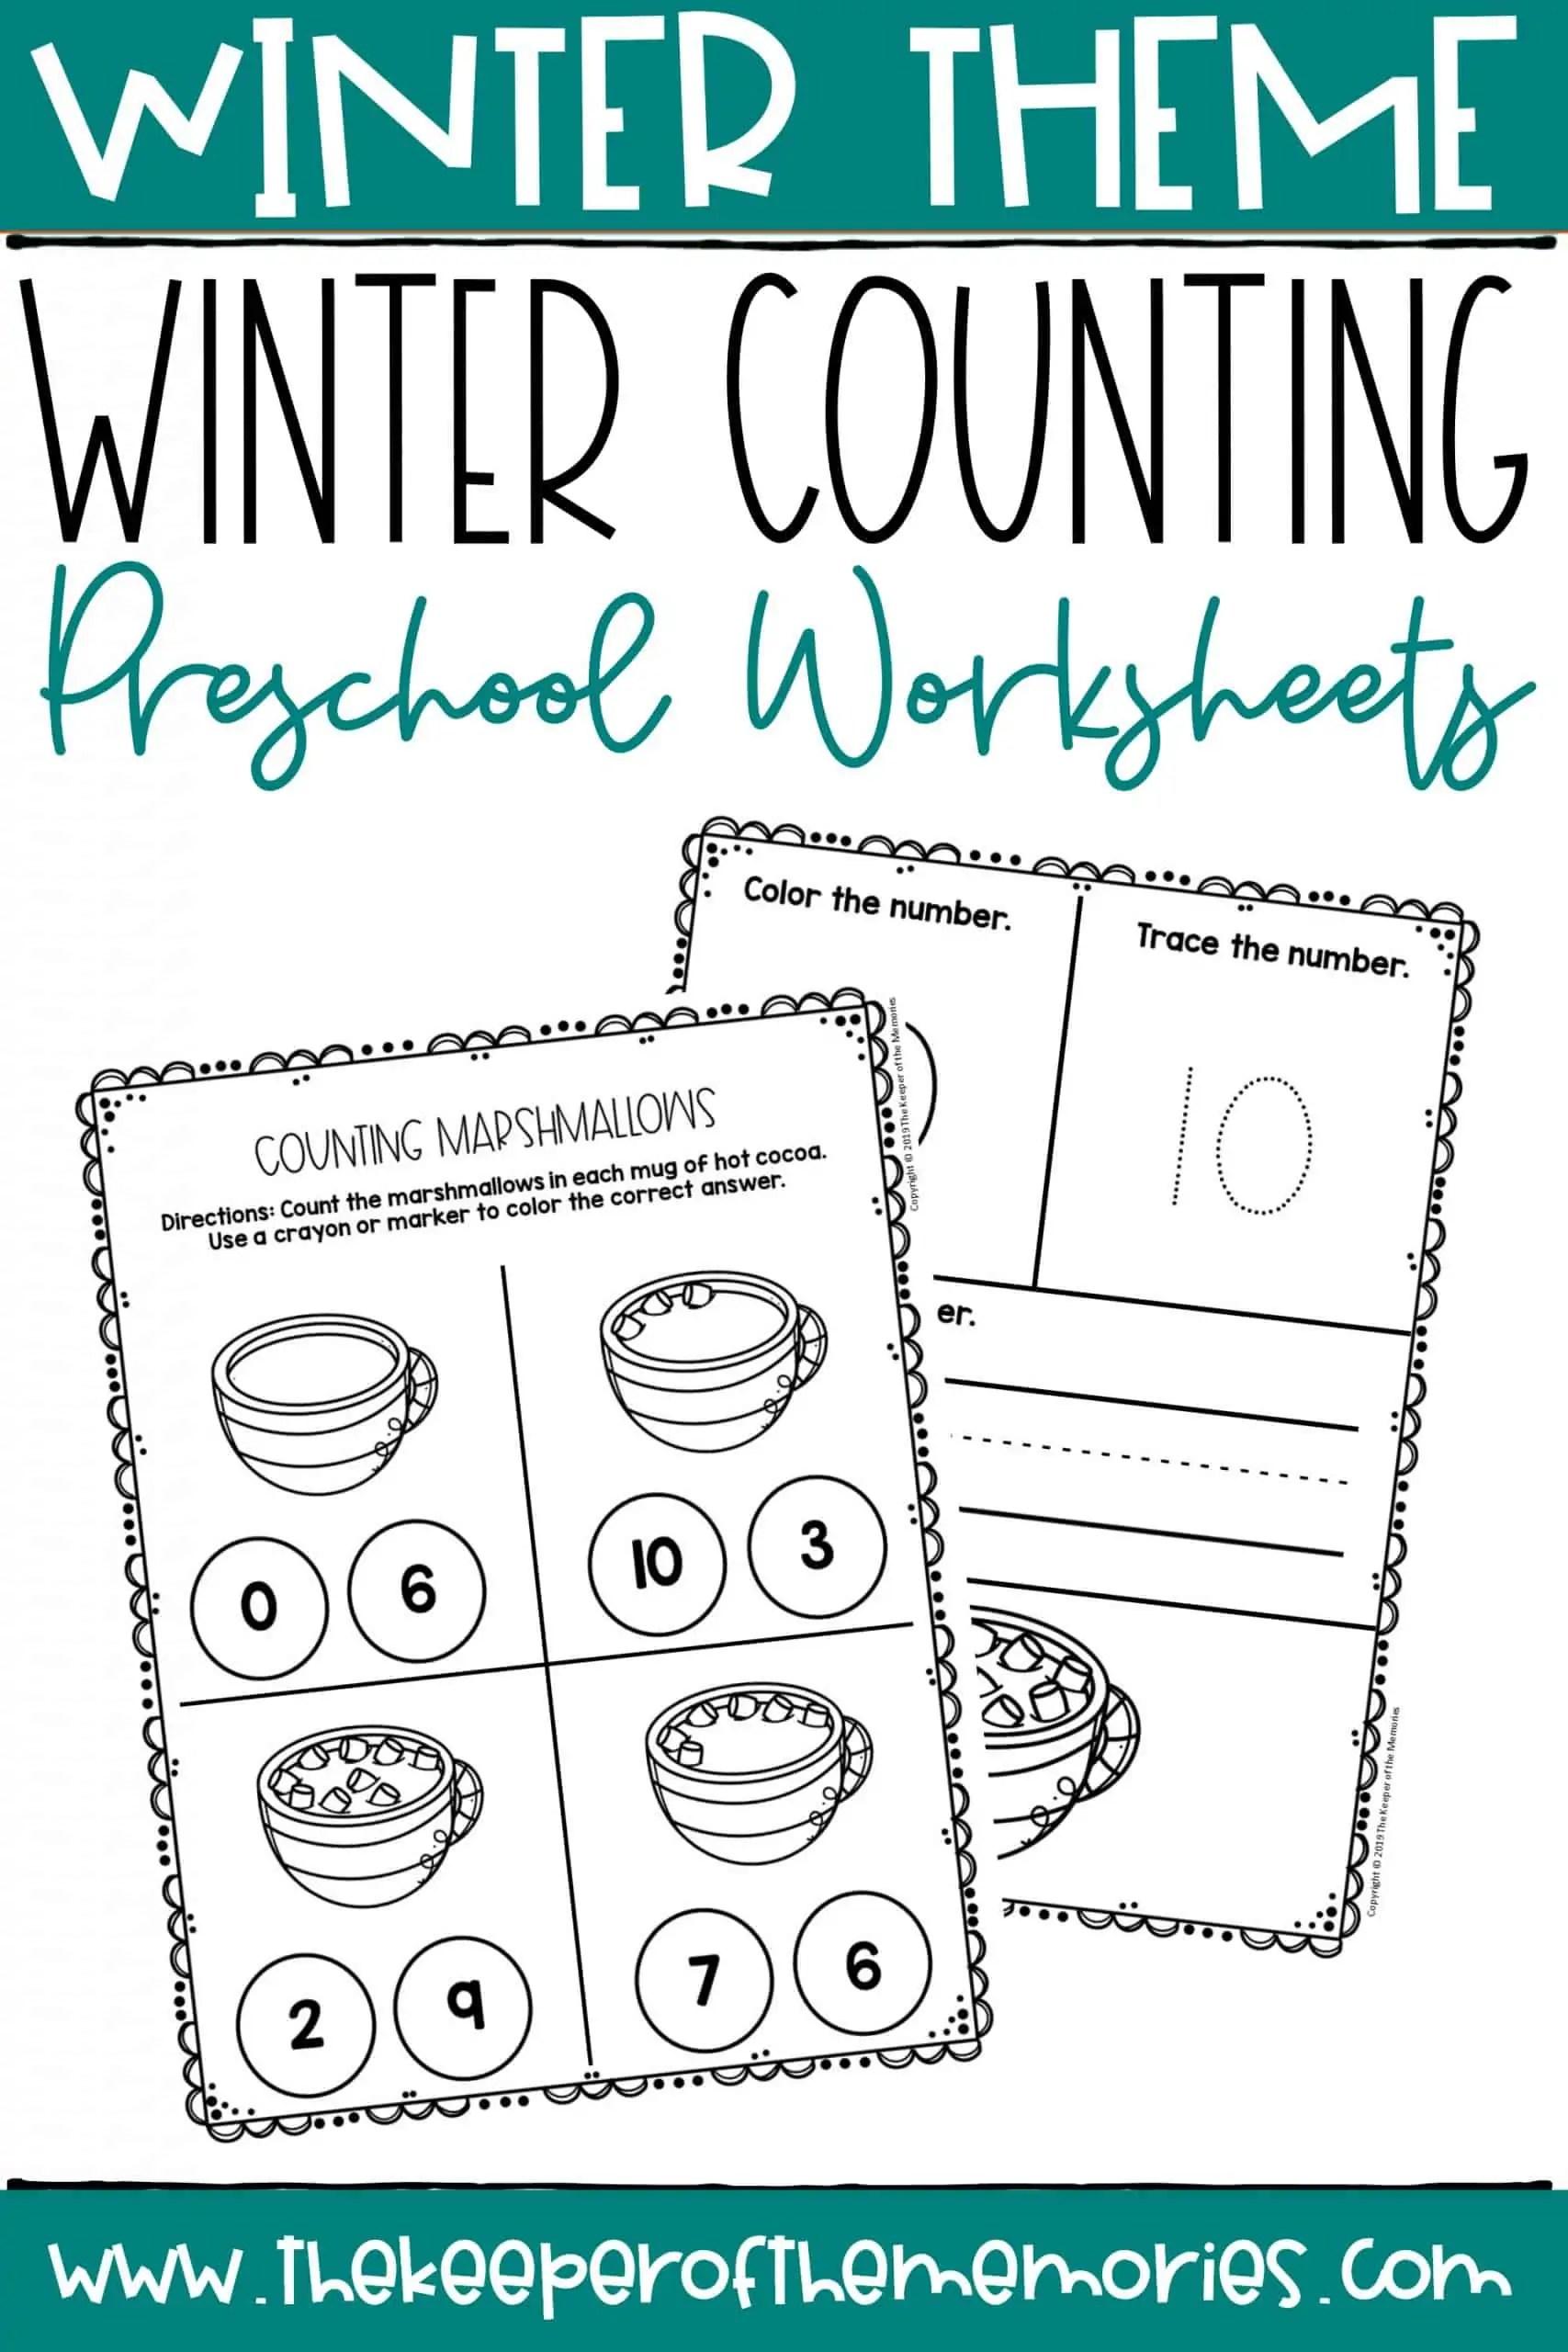 Winter Counting Preschool Worksheets